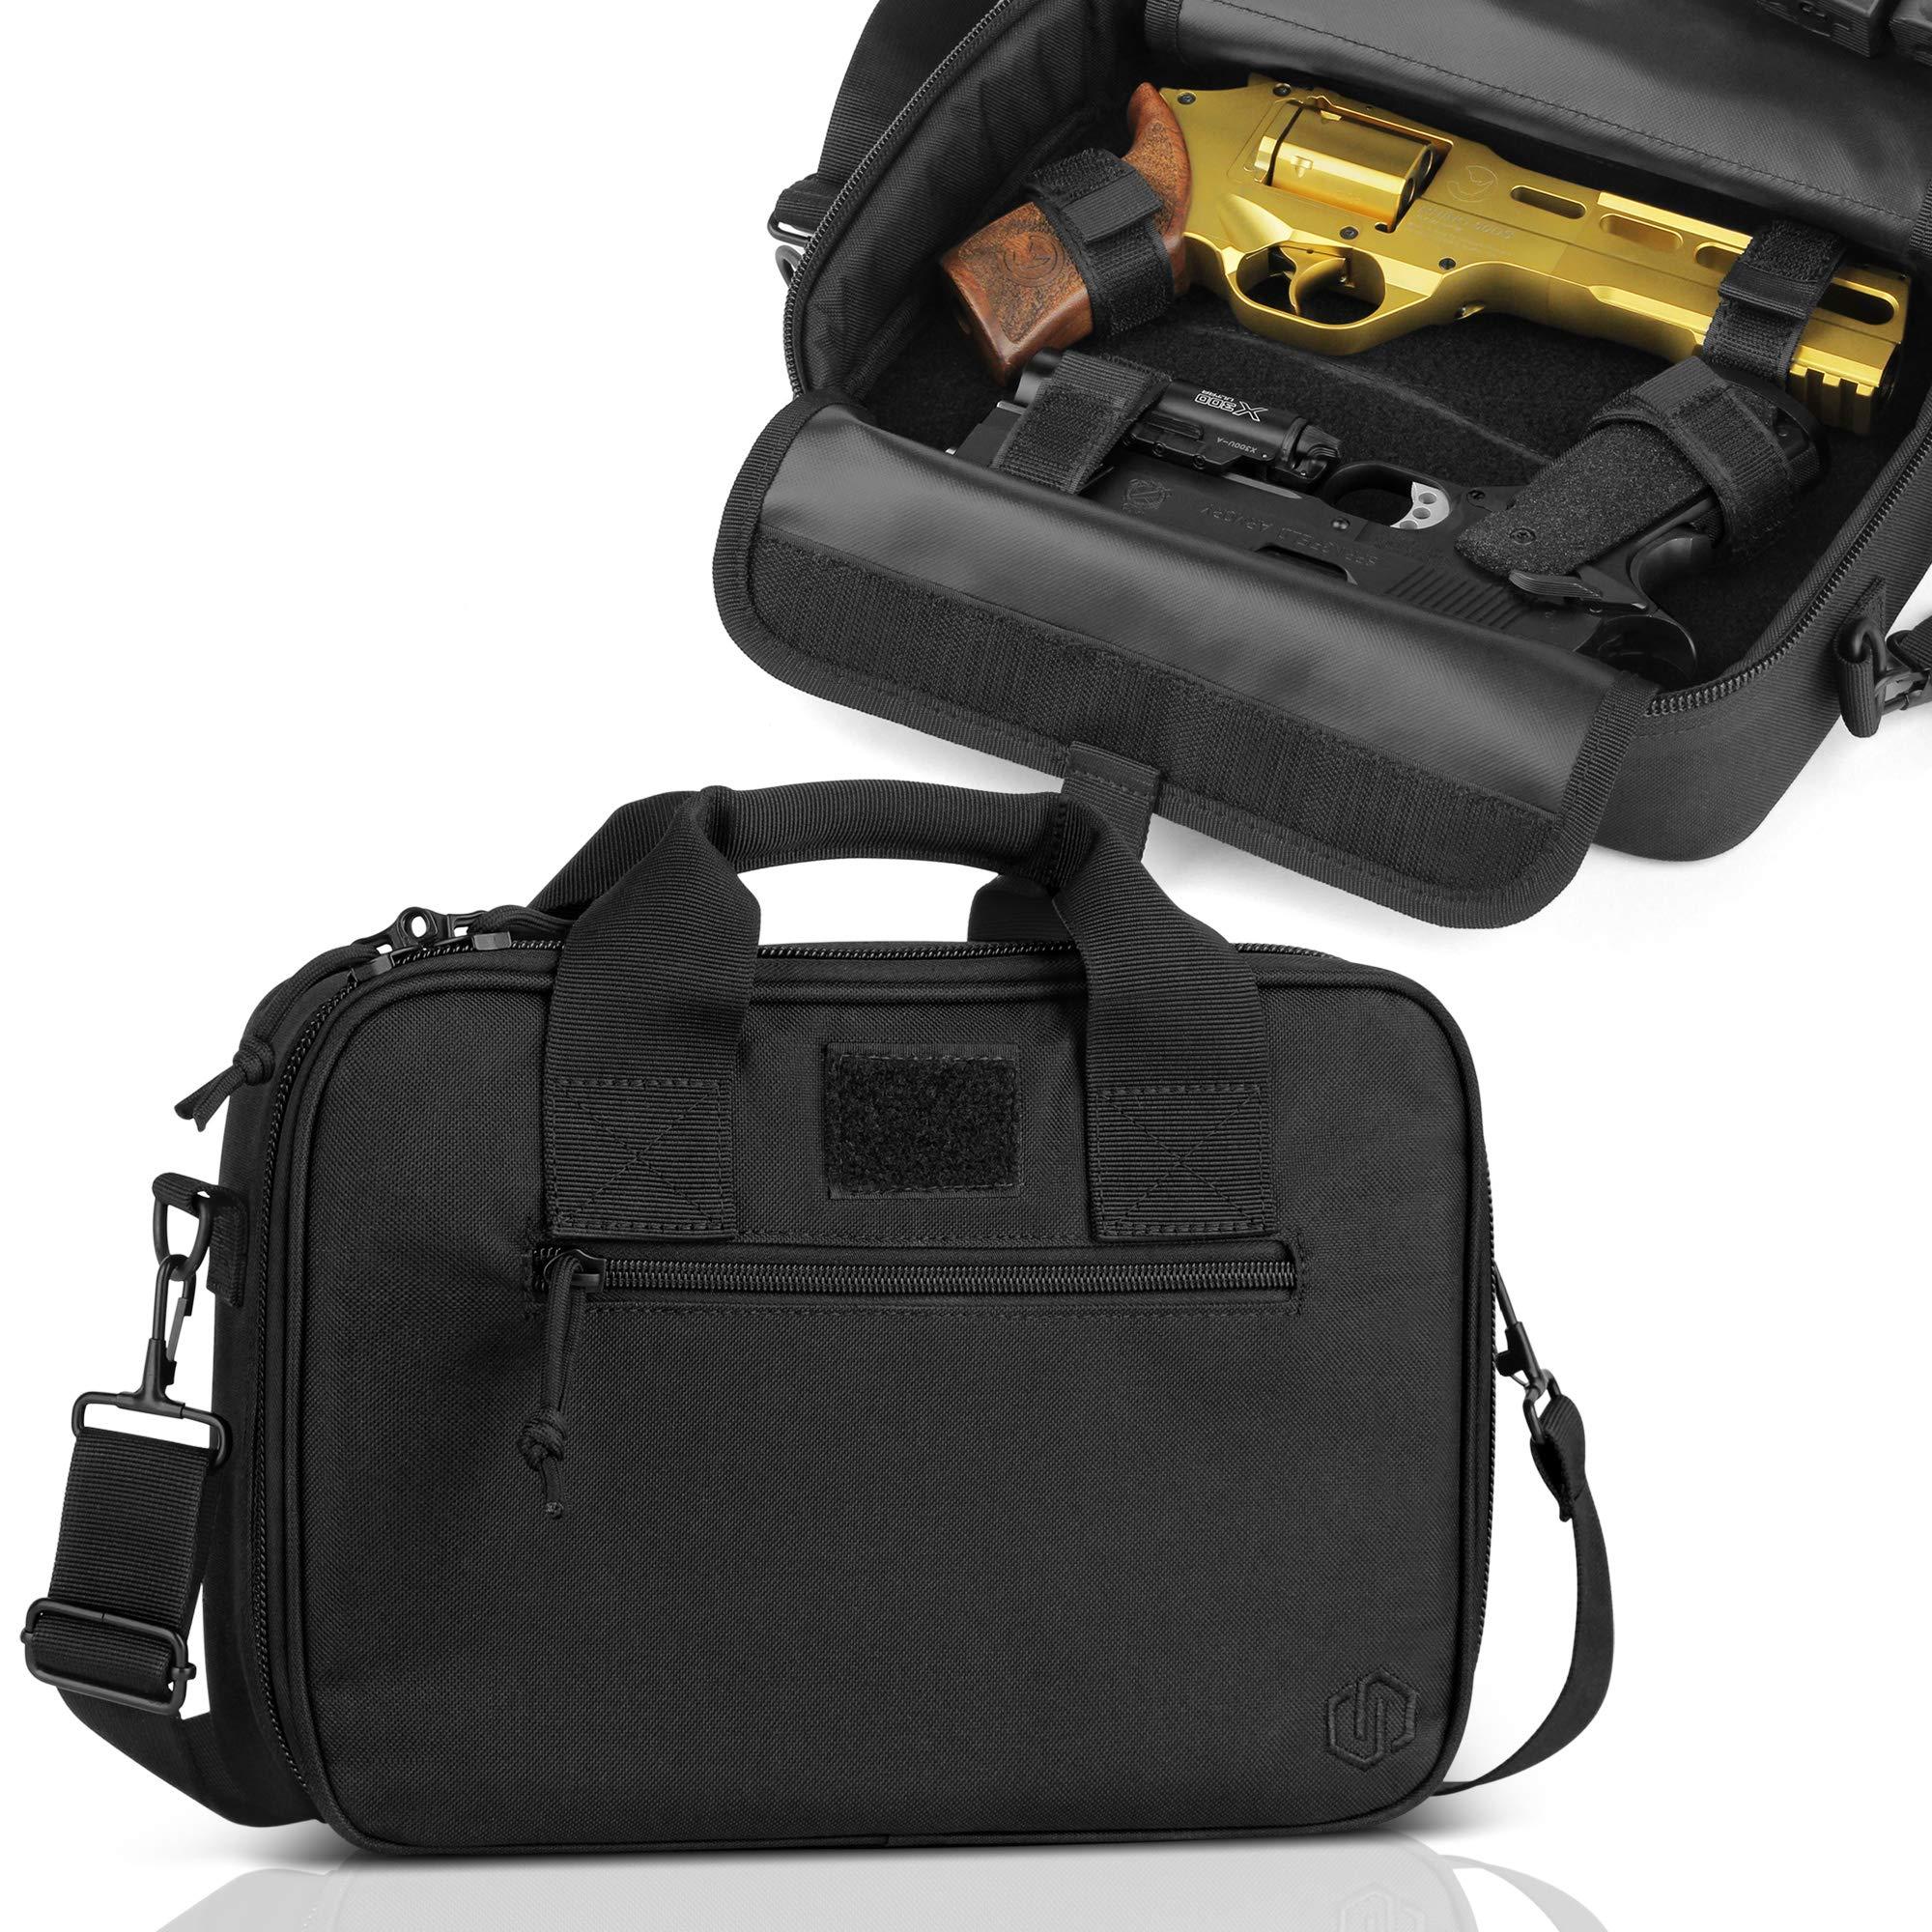 Savior Equipment Tactical Double Handgun Firearm Case Discreet Pistol Bag - Additional Magazine Storage Slots, Lockable Compartment w/Adjustable Shoulder Strap by Savior Equipment